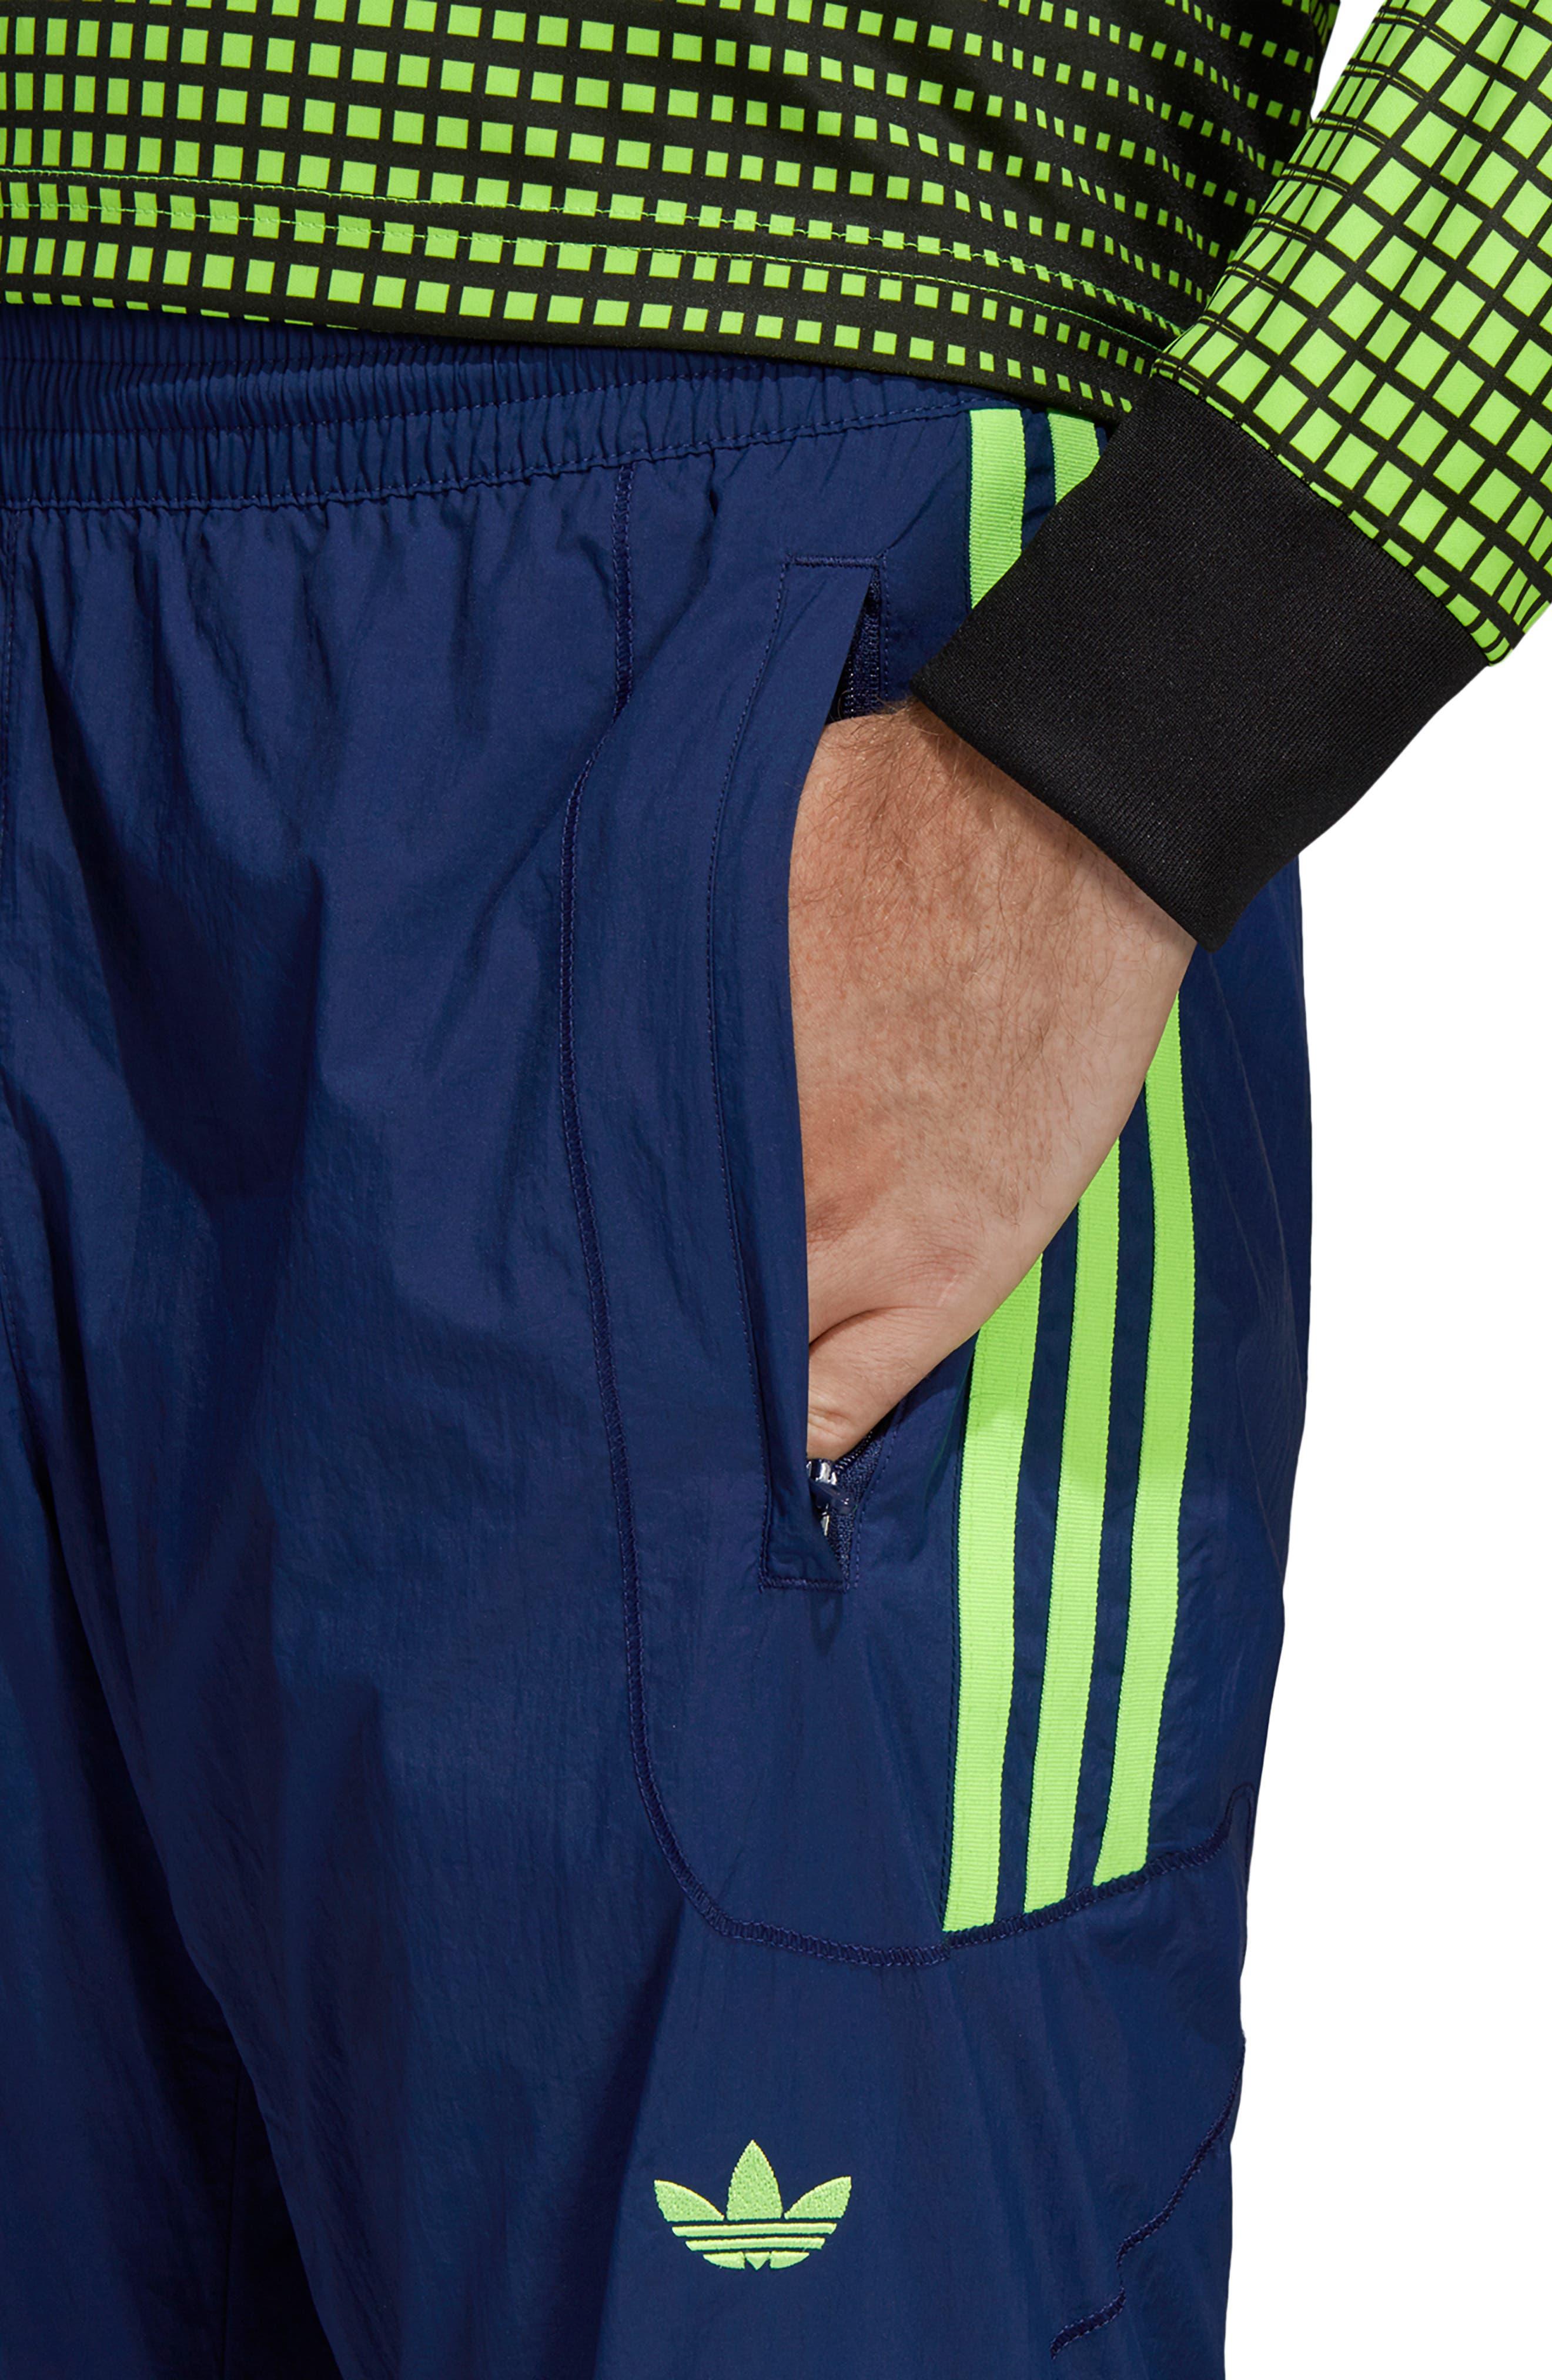 ADIDAS ORIGINALS,                             SPT Track Pants,                             Alternate thumbnail 4, color,                             DARK BLUE